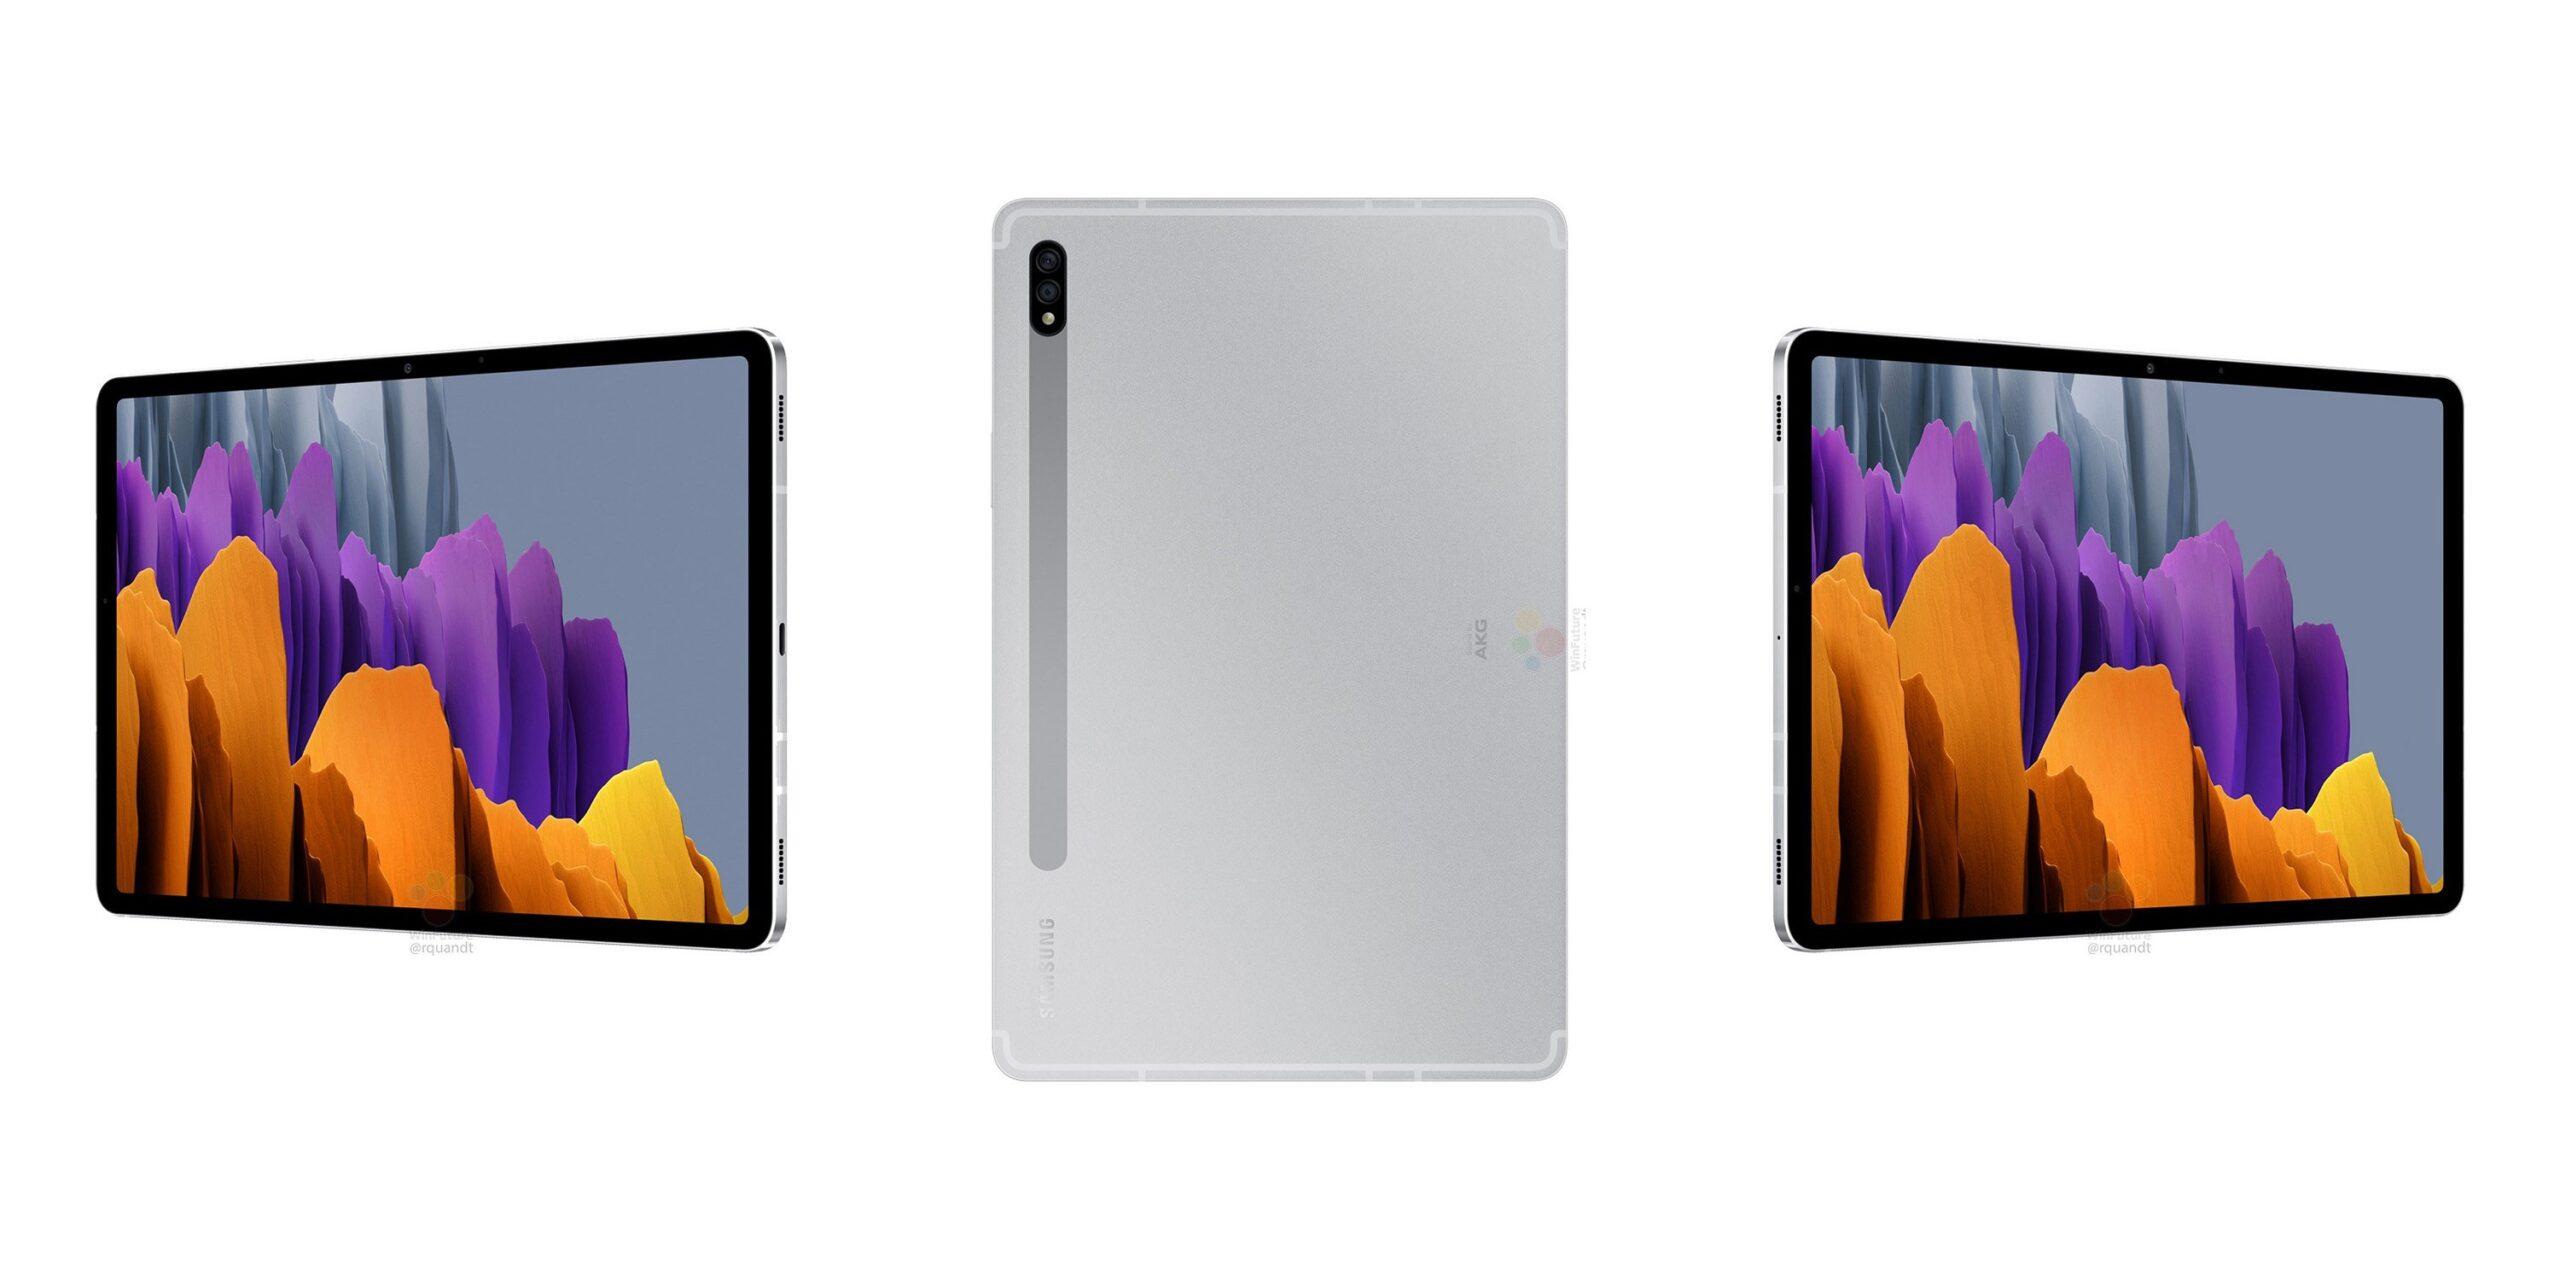 Bocoran Spesifikasi Galaxy Tab S7 dengan layar AMOLED